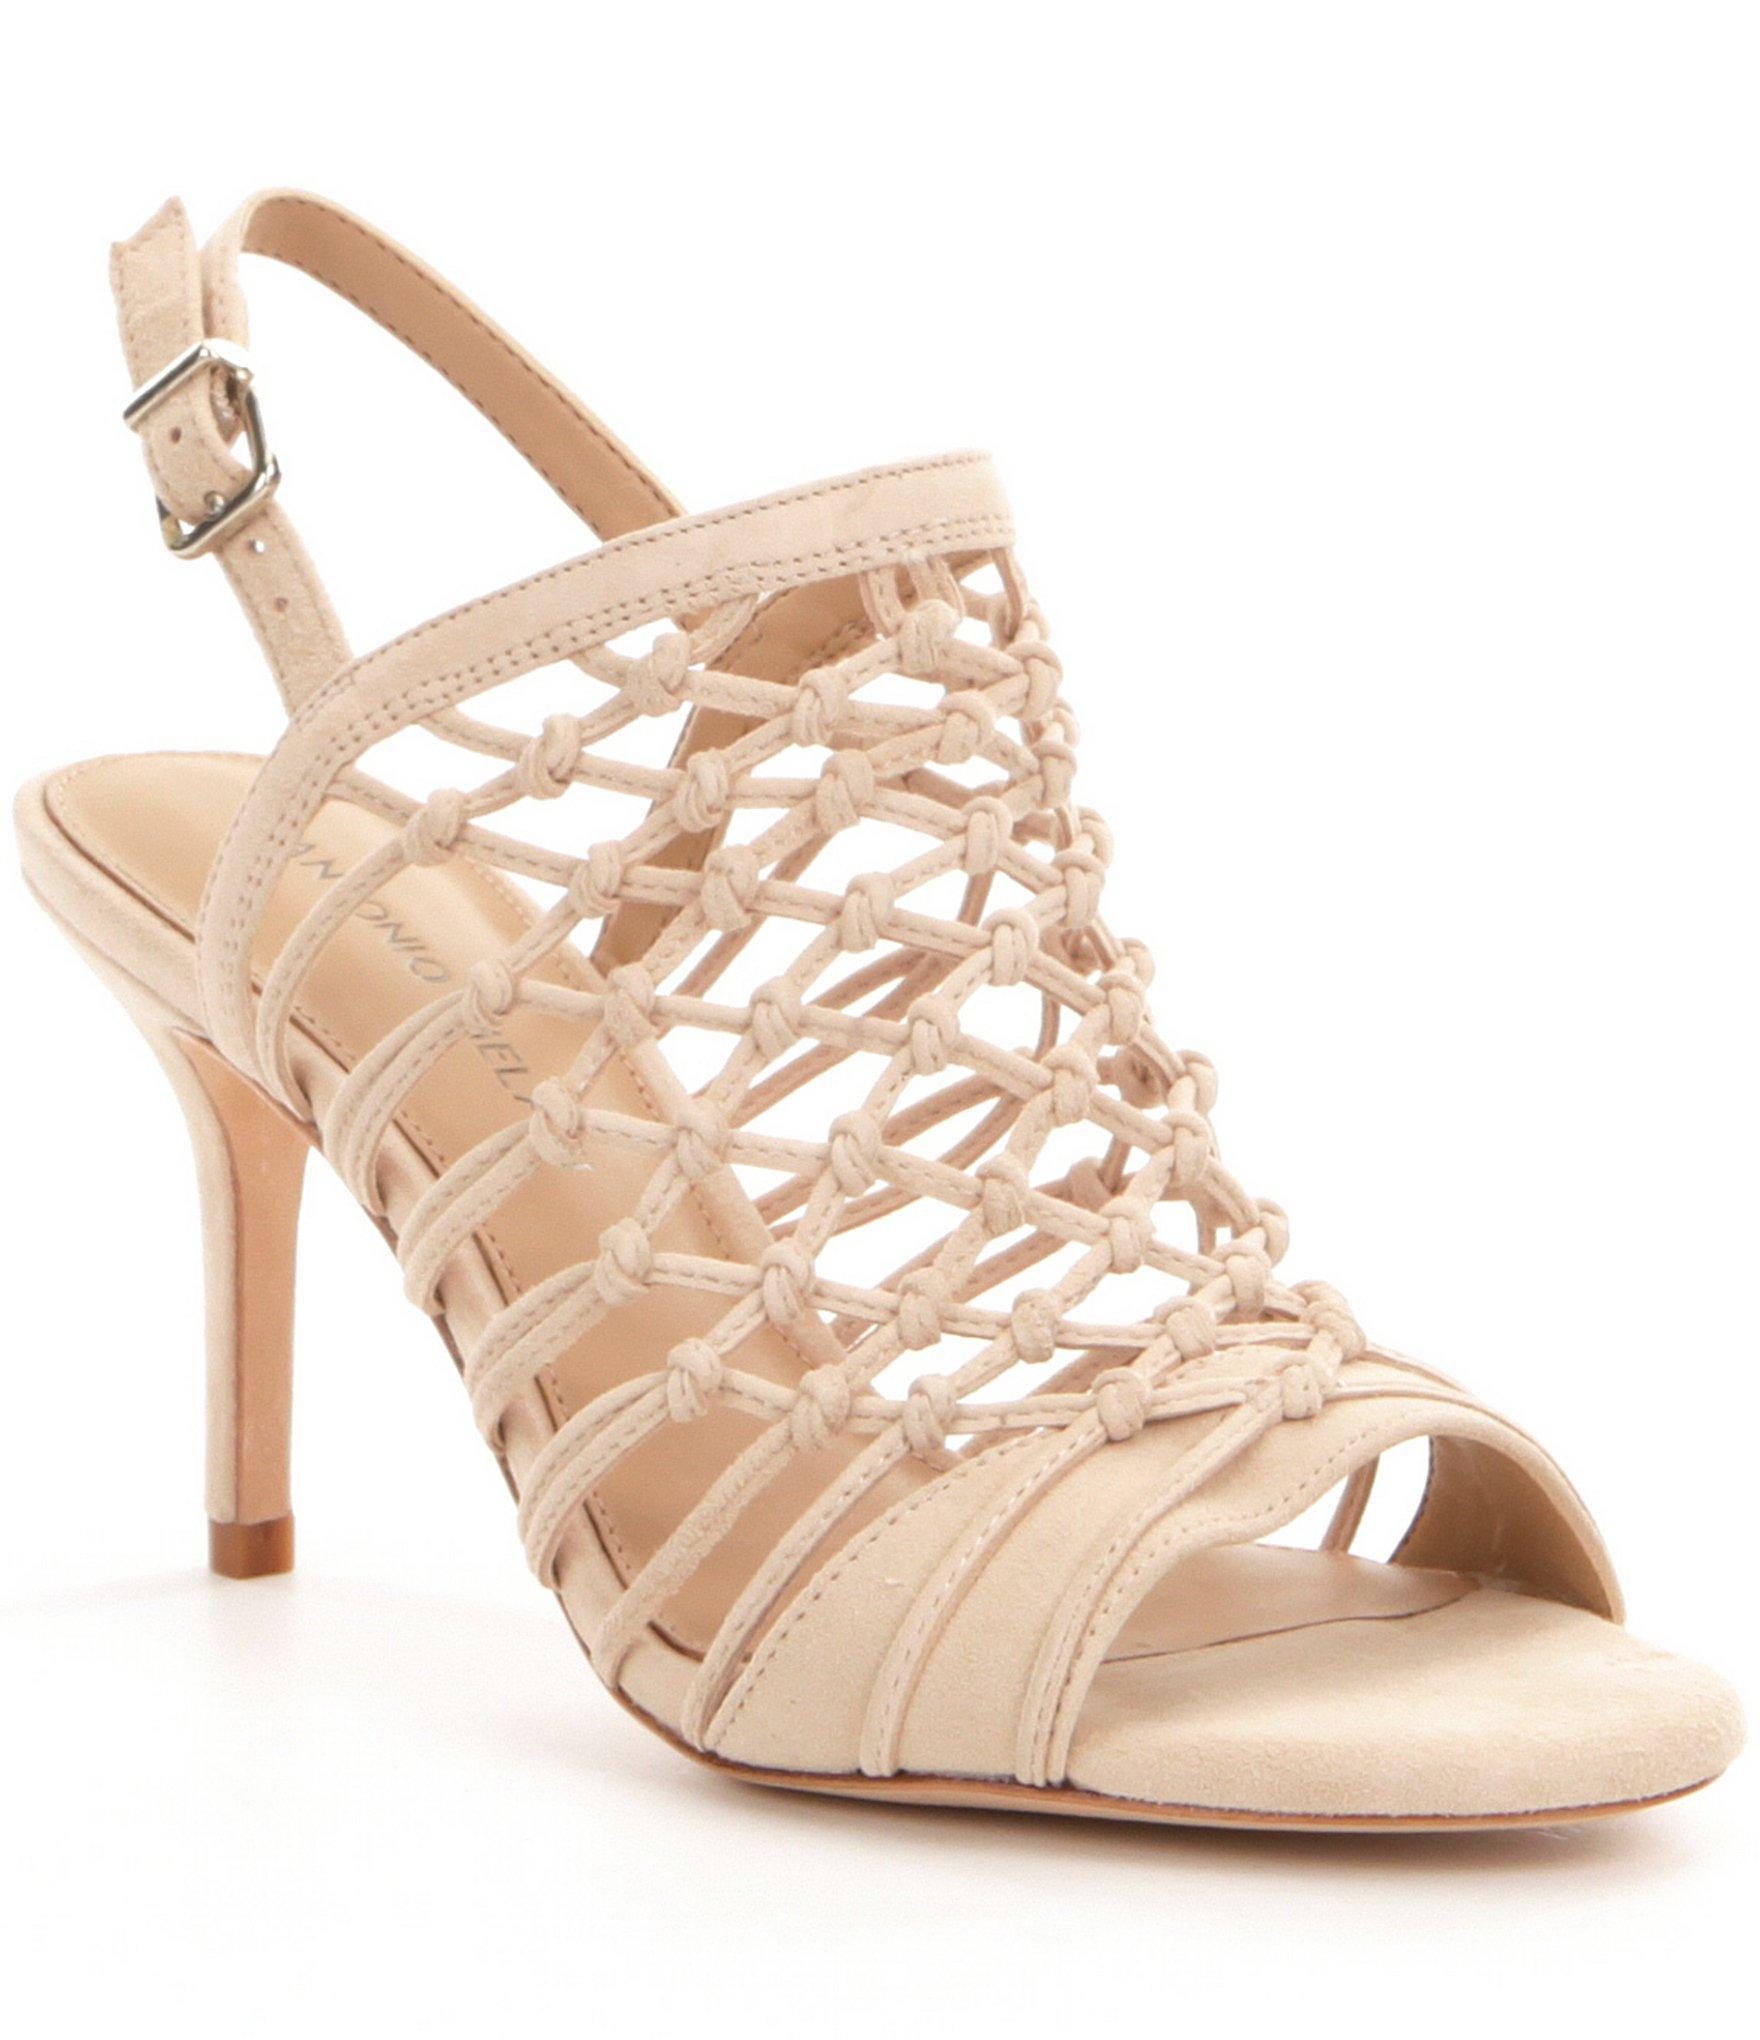 Lyst Antonio Melani Jair Caged Dress Sandals In Natural